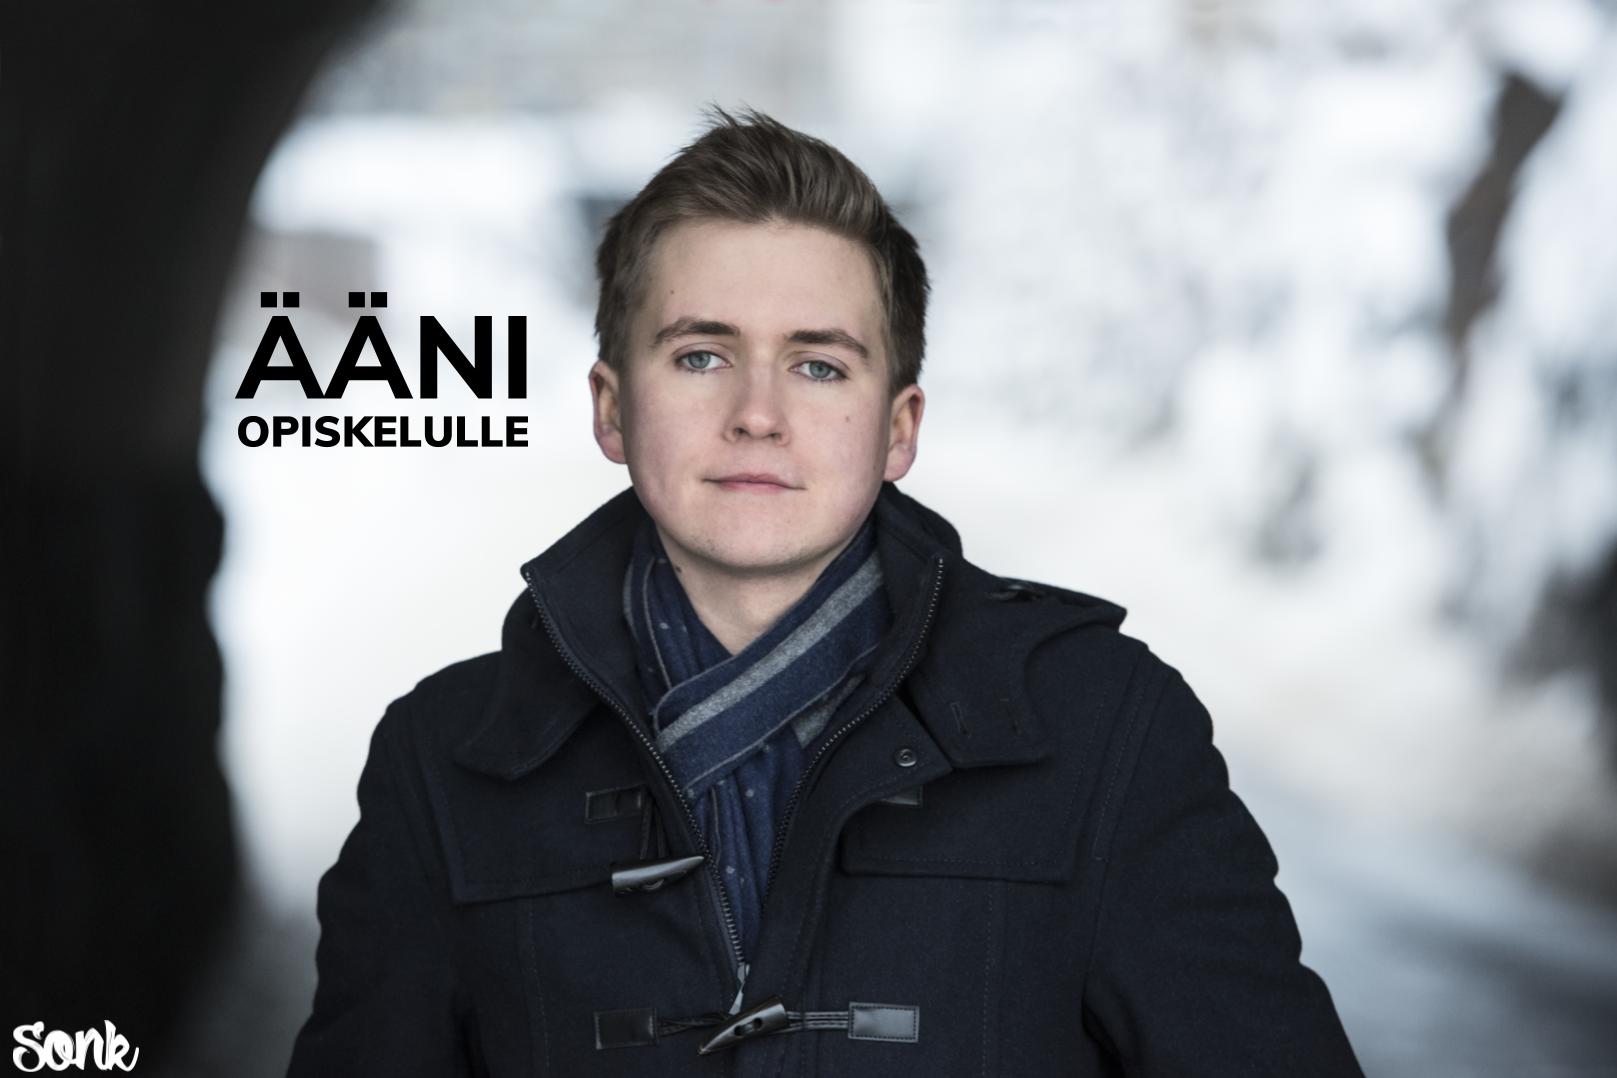 Markus Myllyniemi